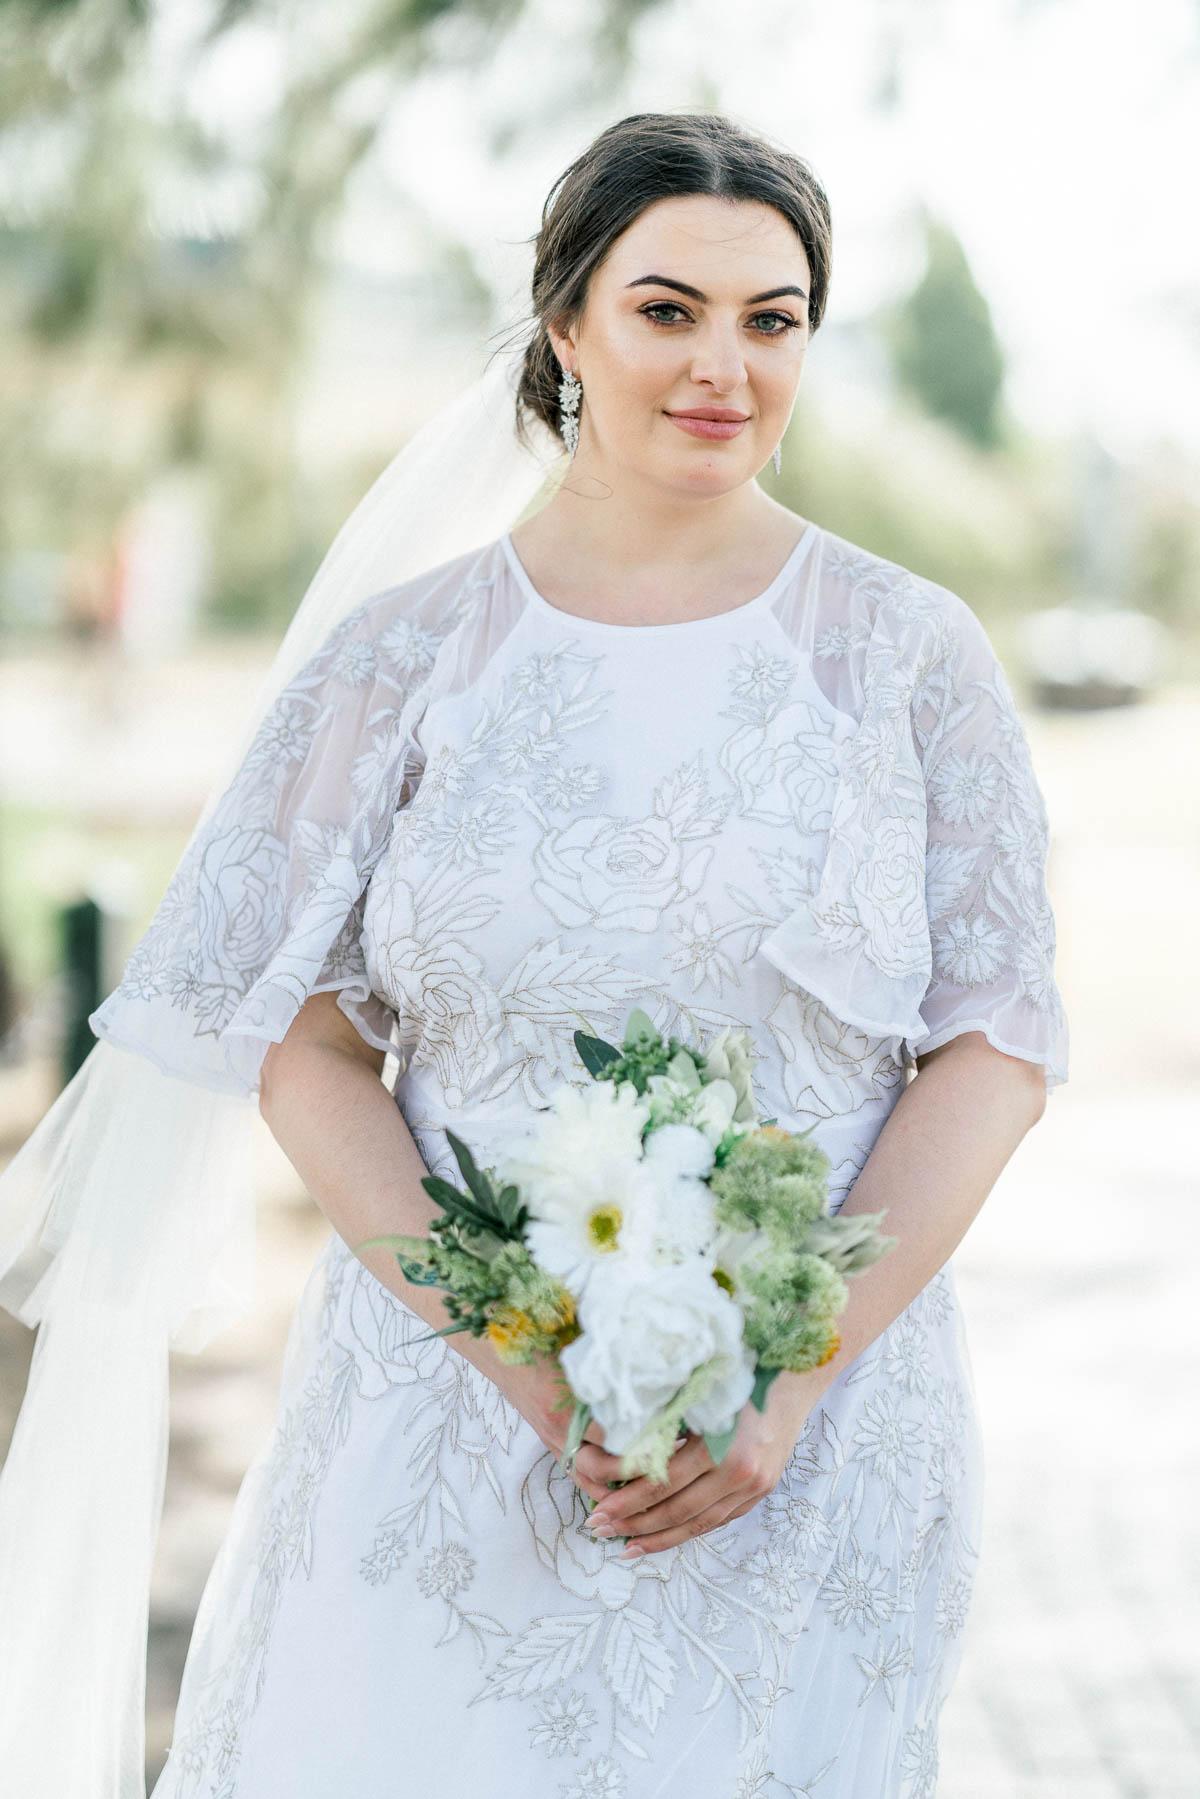 little-henri-cafe-wedding-thornbury-heart+soul-weddings-jane-aaron-05345.jpg